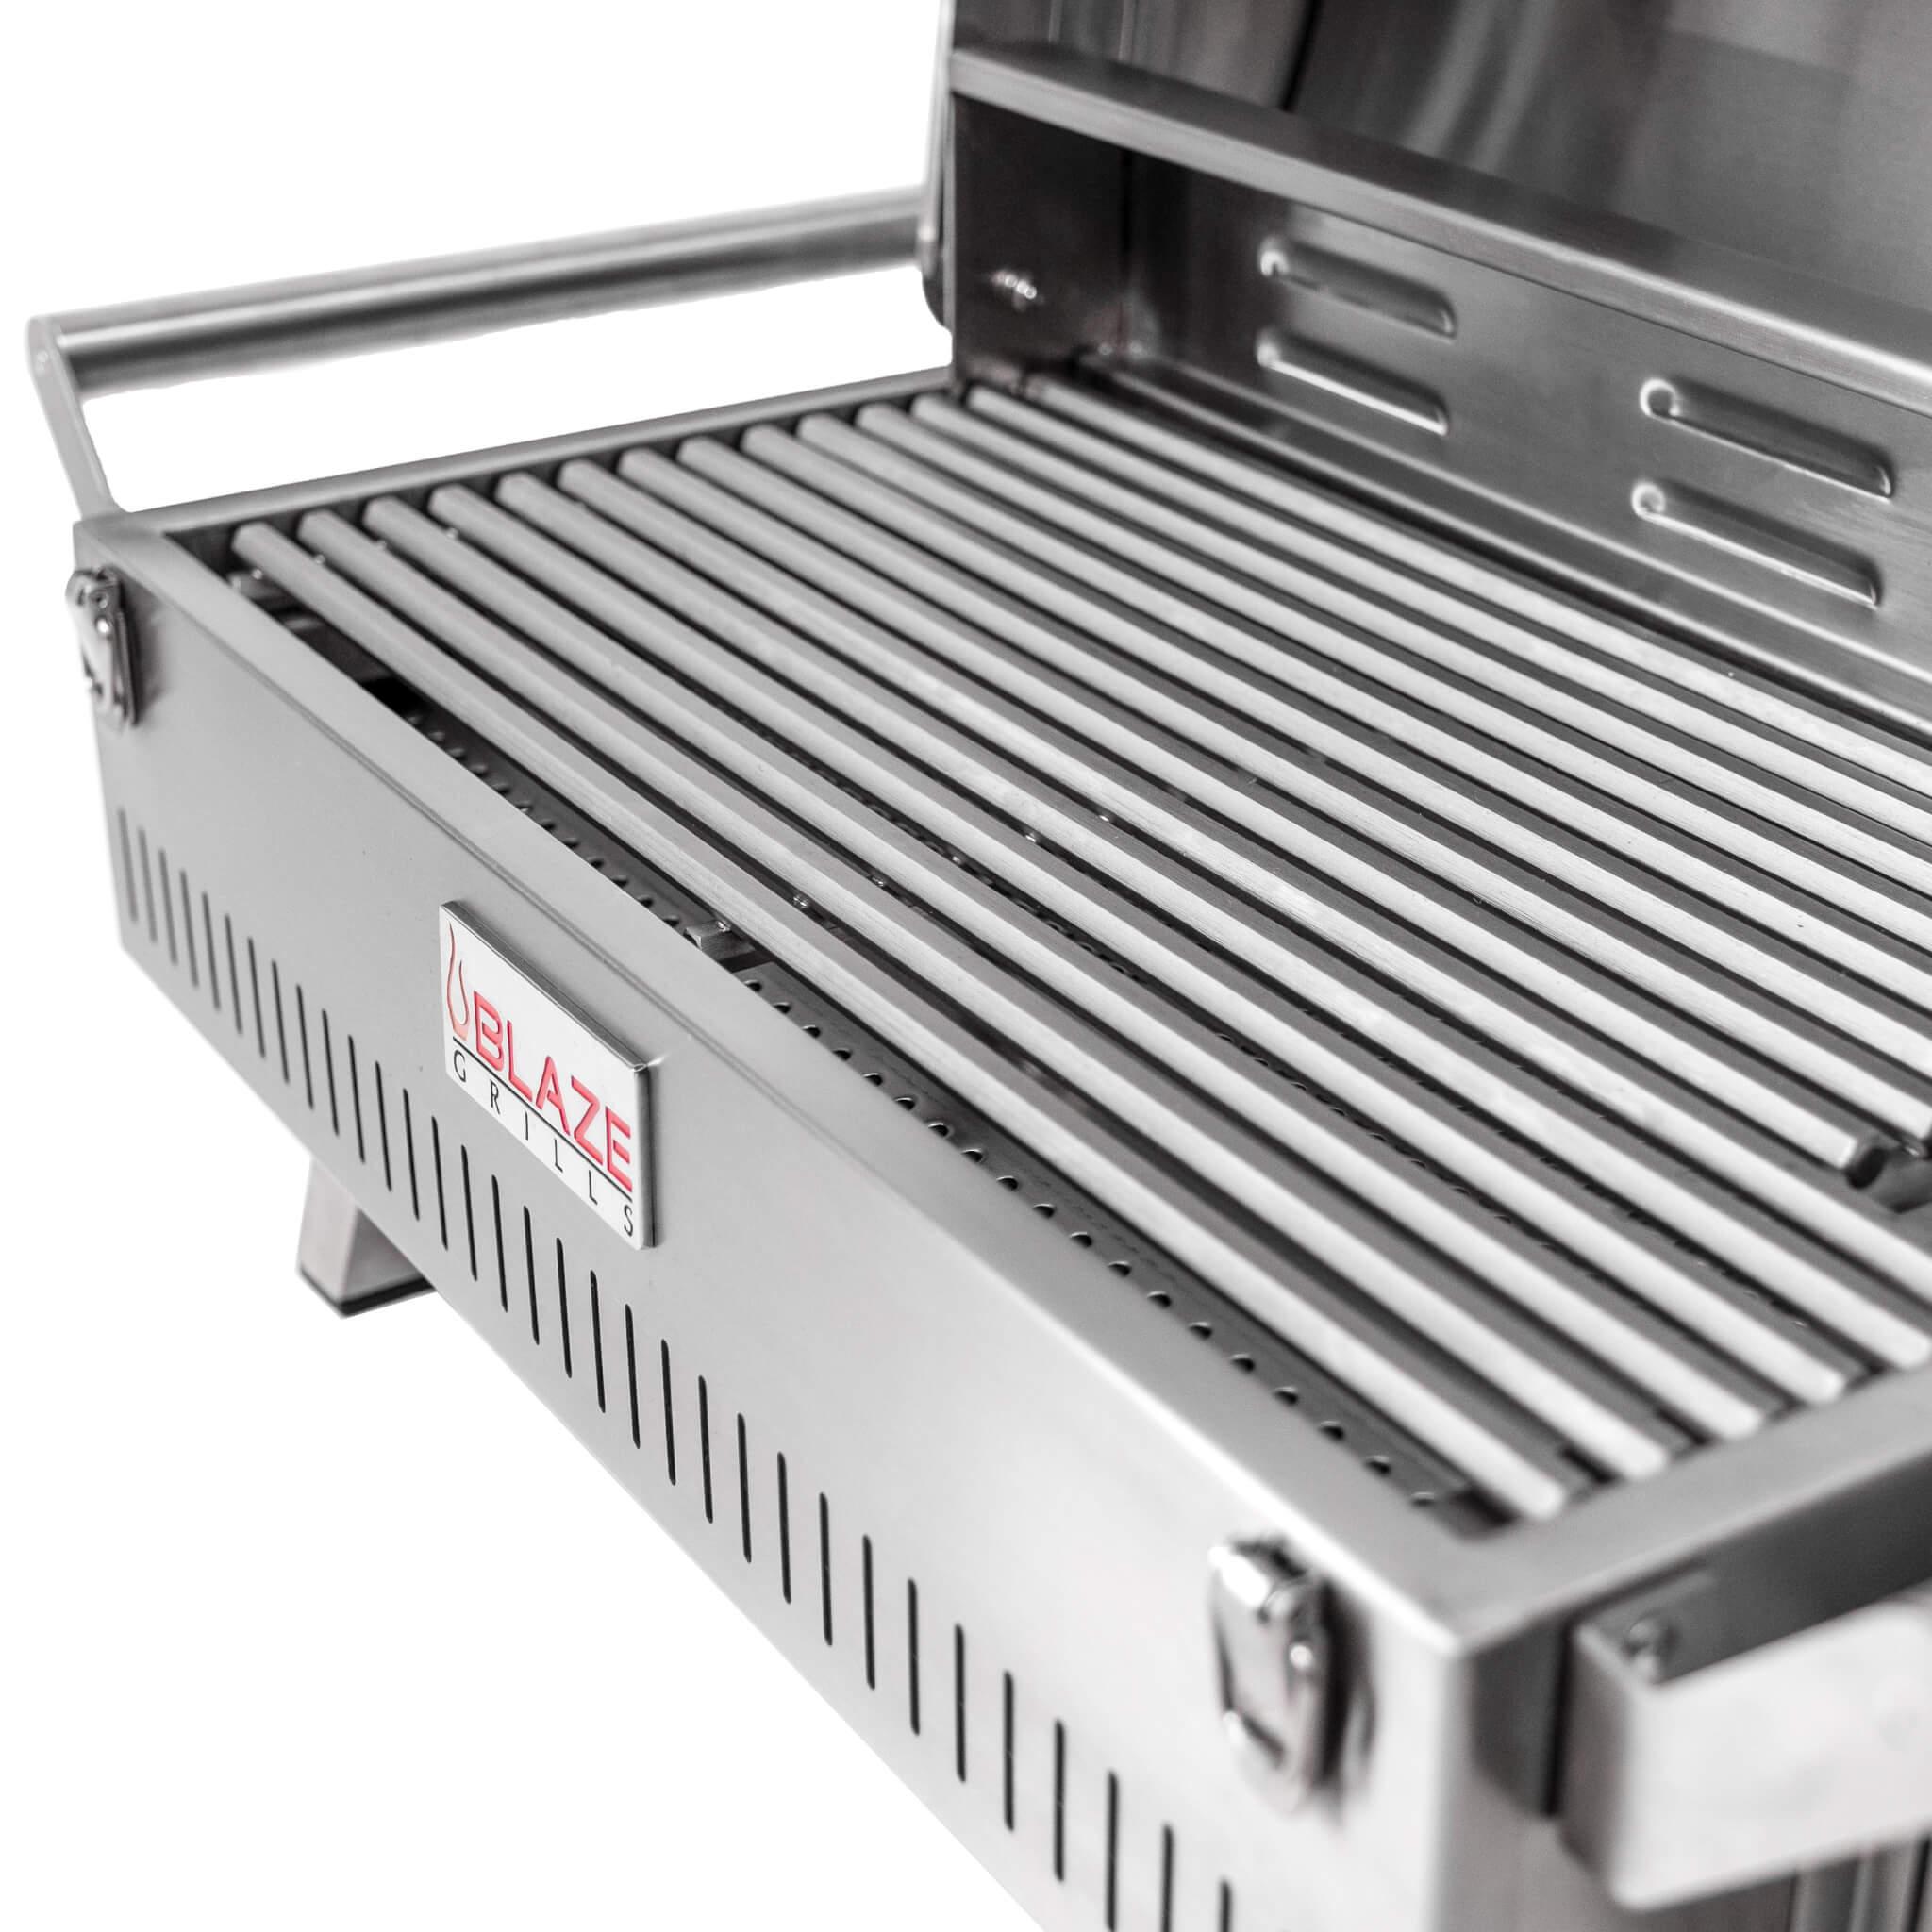 Blaze Professional Portable Propane Gas Grill